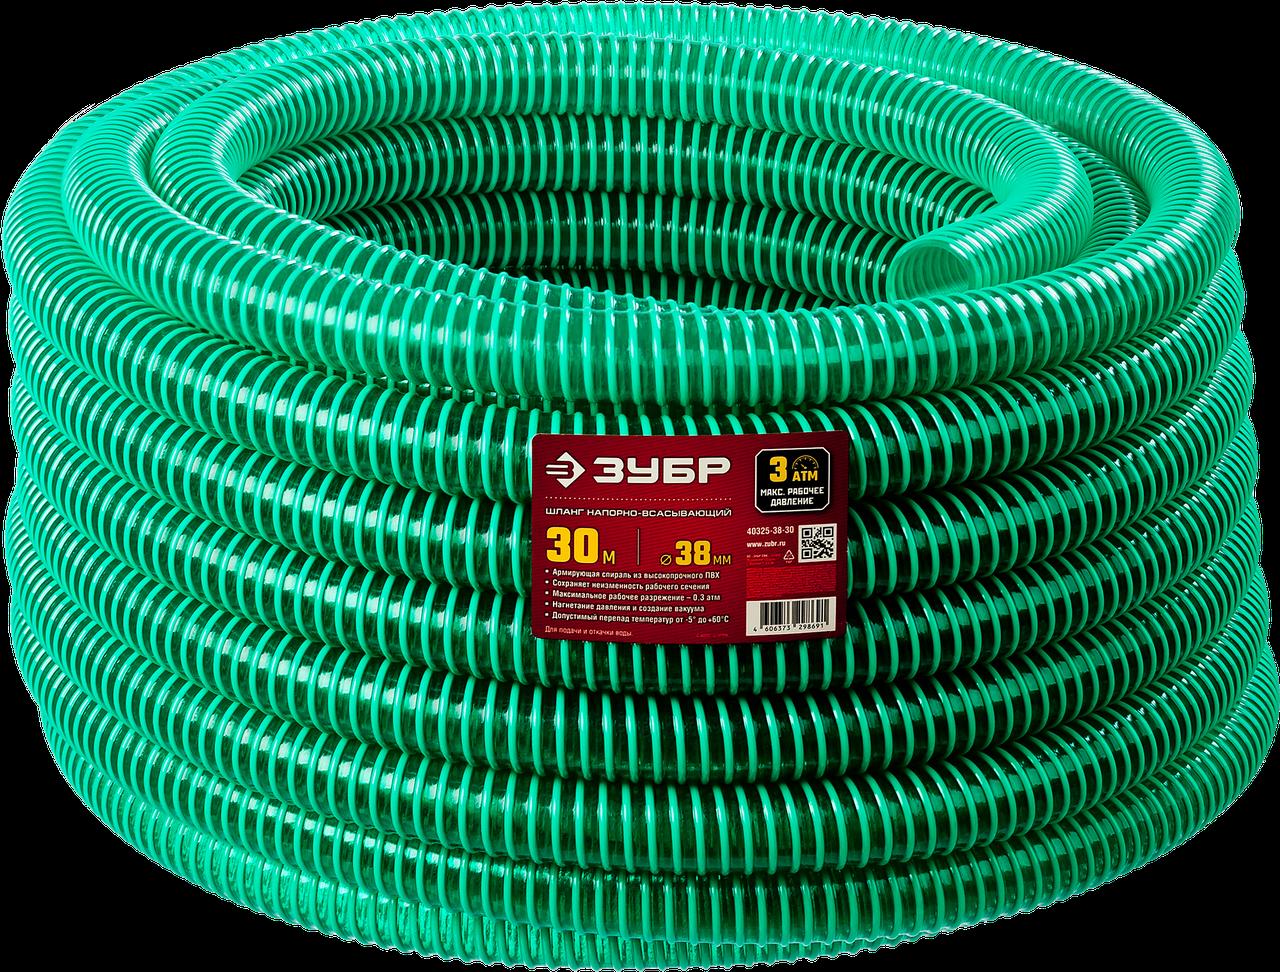 ЗУБР Шланг напорно-всасывающий со спиралью ПВХ, 3 атм, 19мм х 15м 360, 38, 30